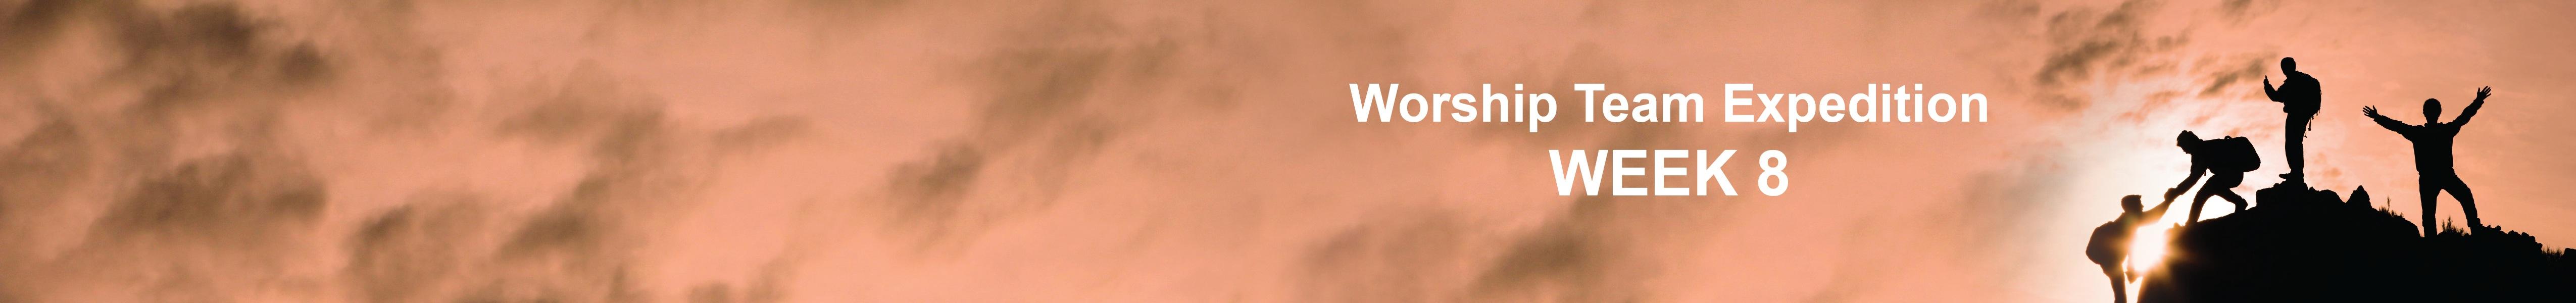 WTEWeek8RevSlider